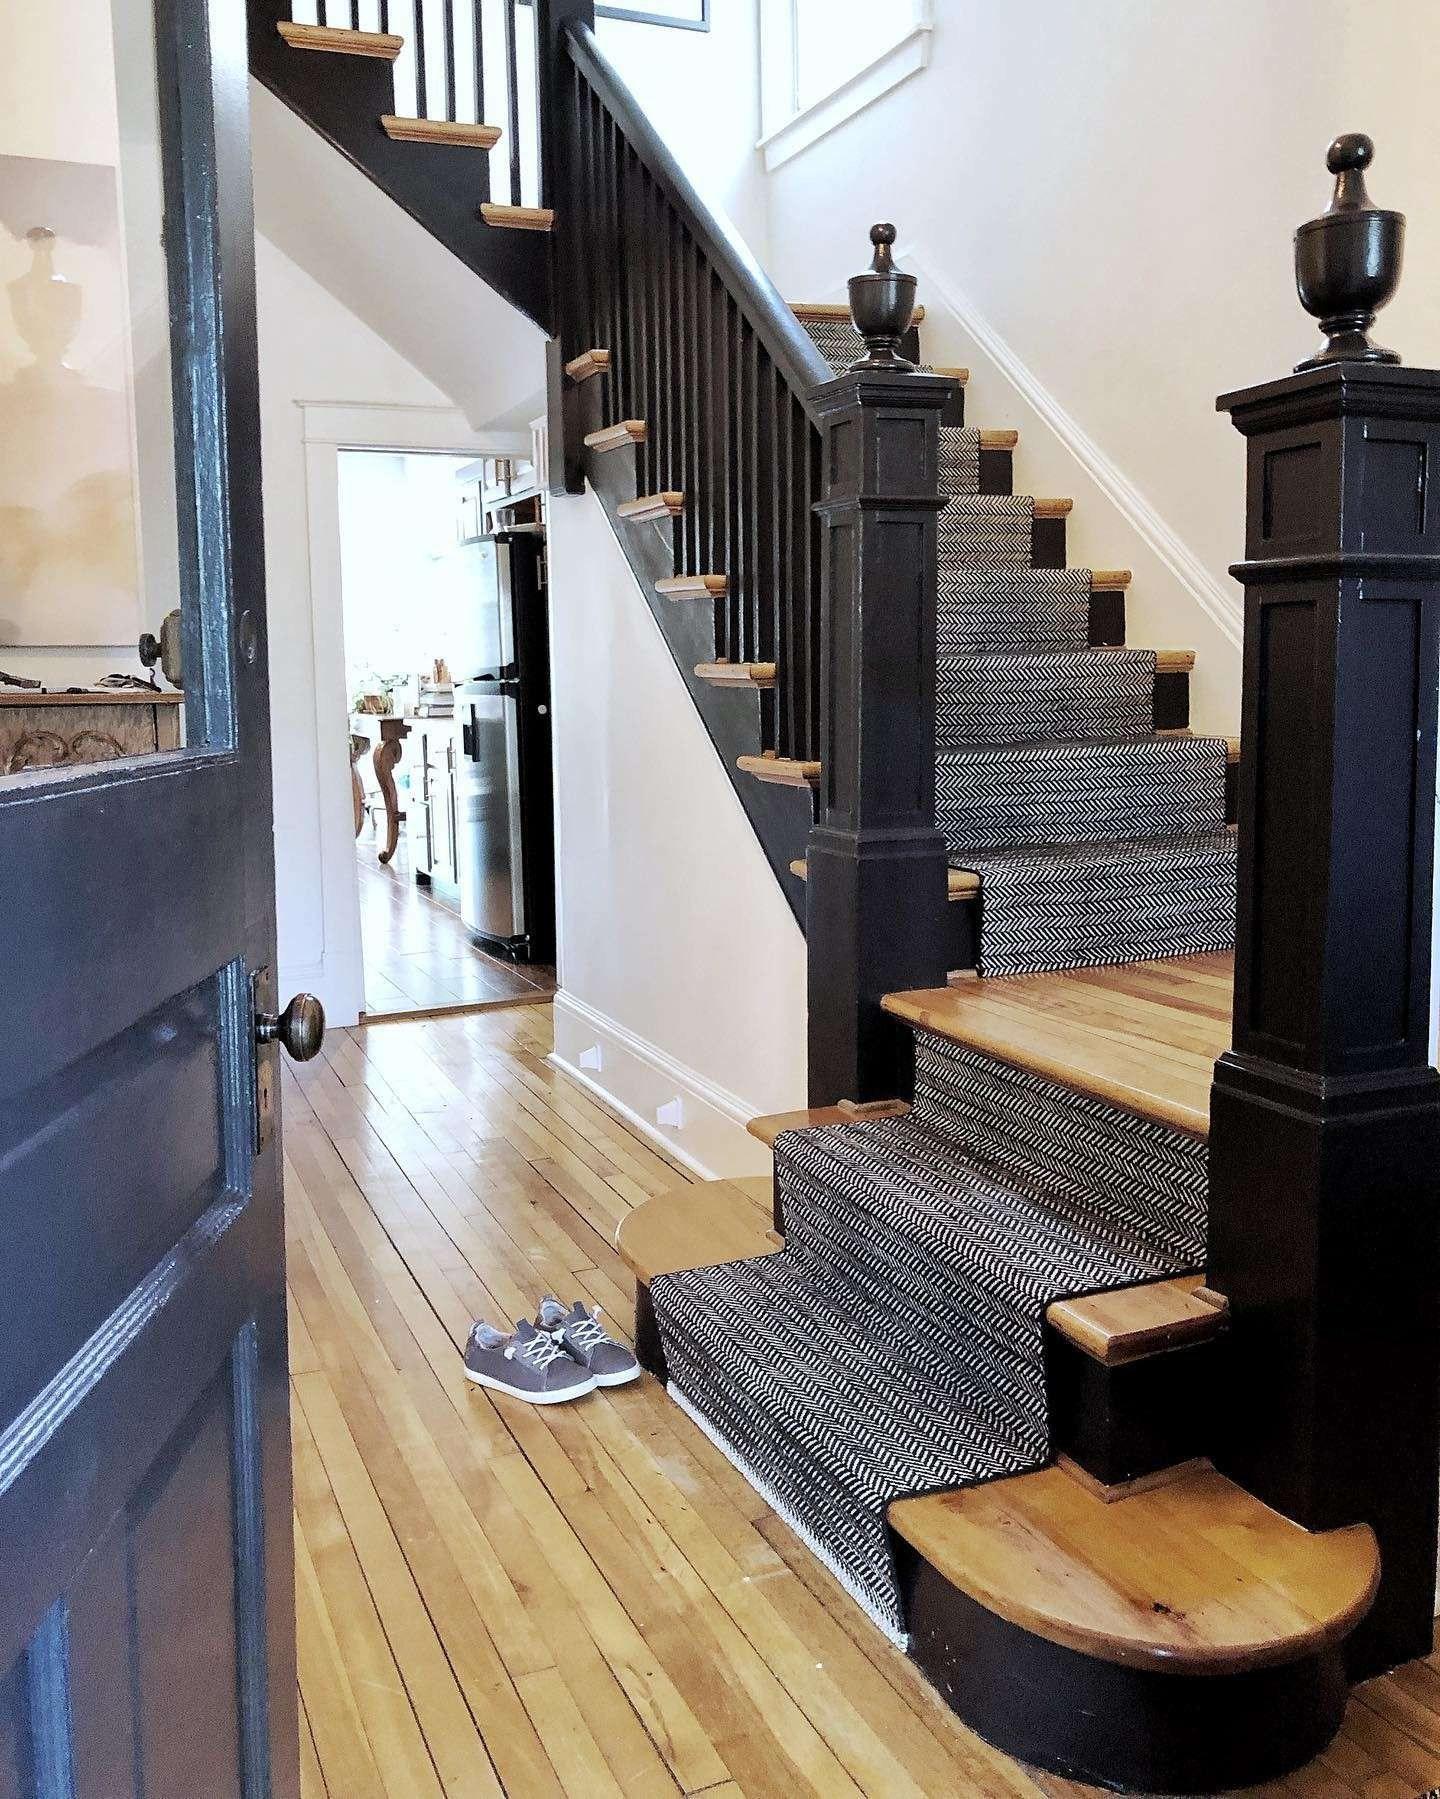 How To Choose A Stair Runner Rug Annie Selke | Rug Runners For Stairs | Wood | Antelope | Hallway | Persian | Mid Century Modern